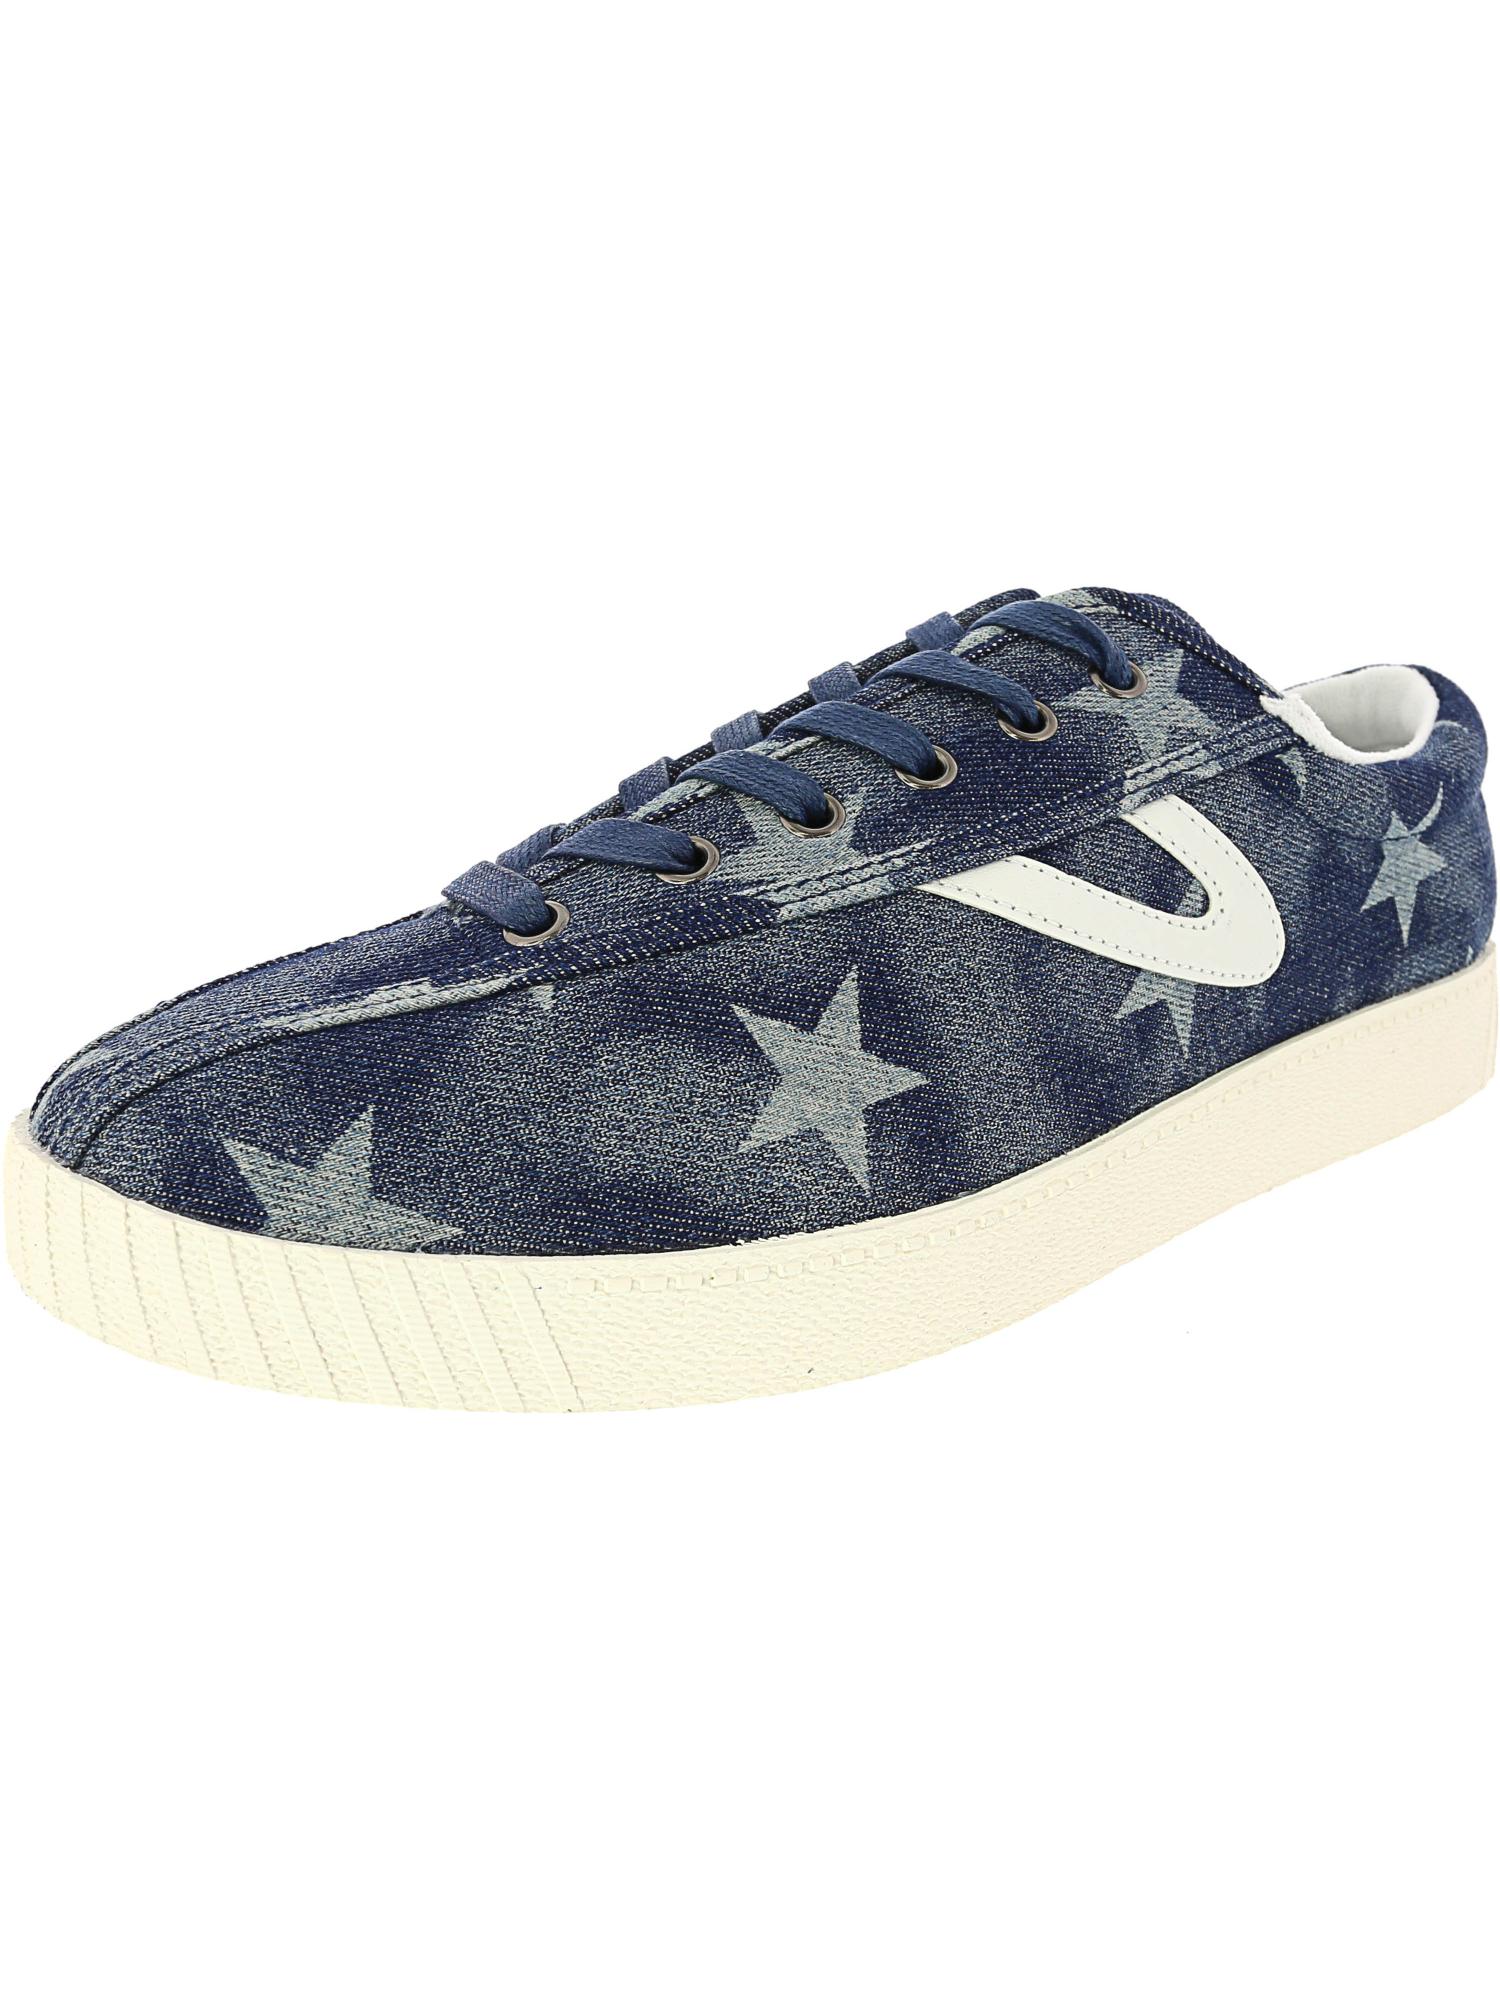 Tretorn Men/'s Nyliteplus Ankle-High Fashion Sneaker